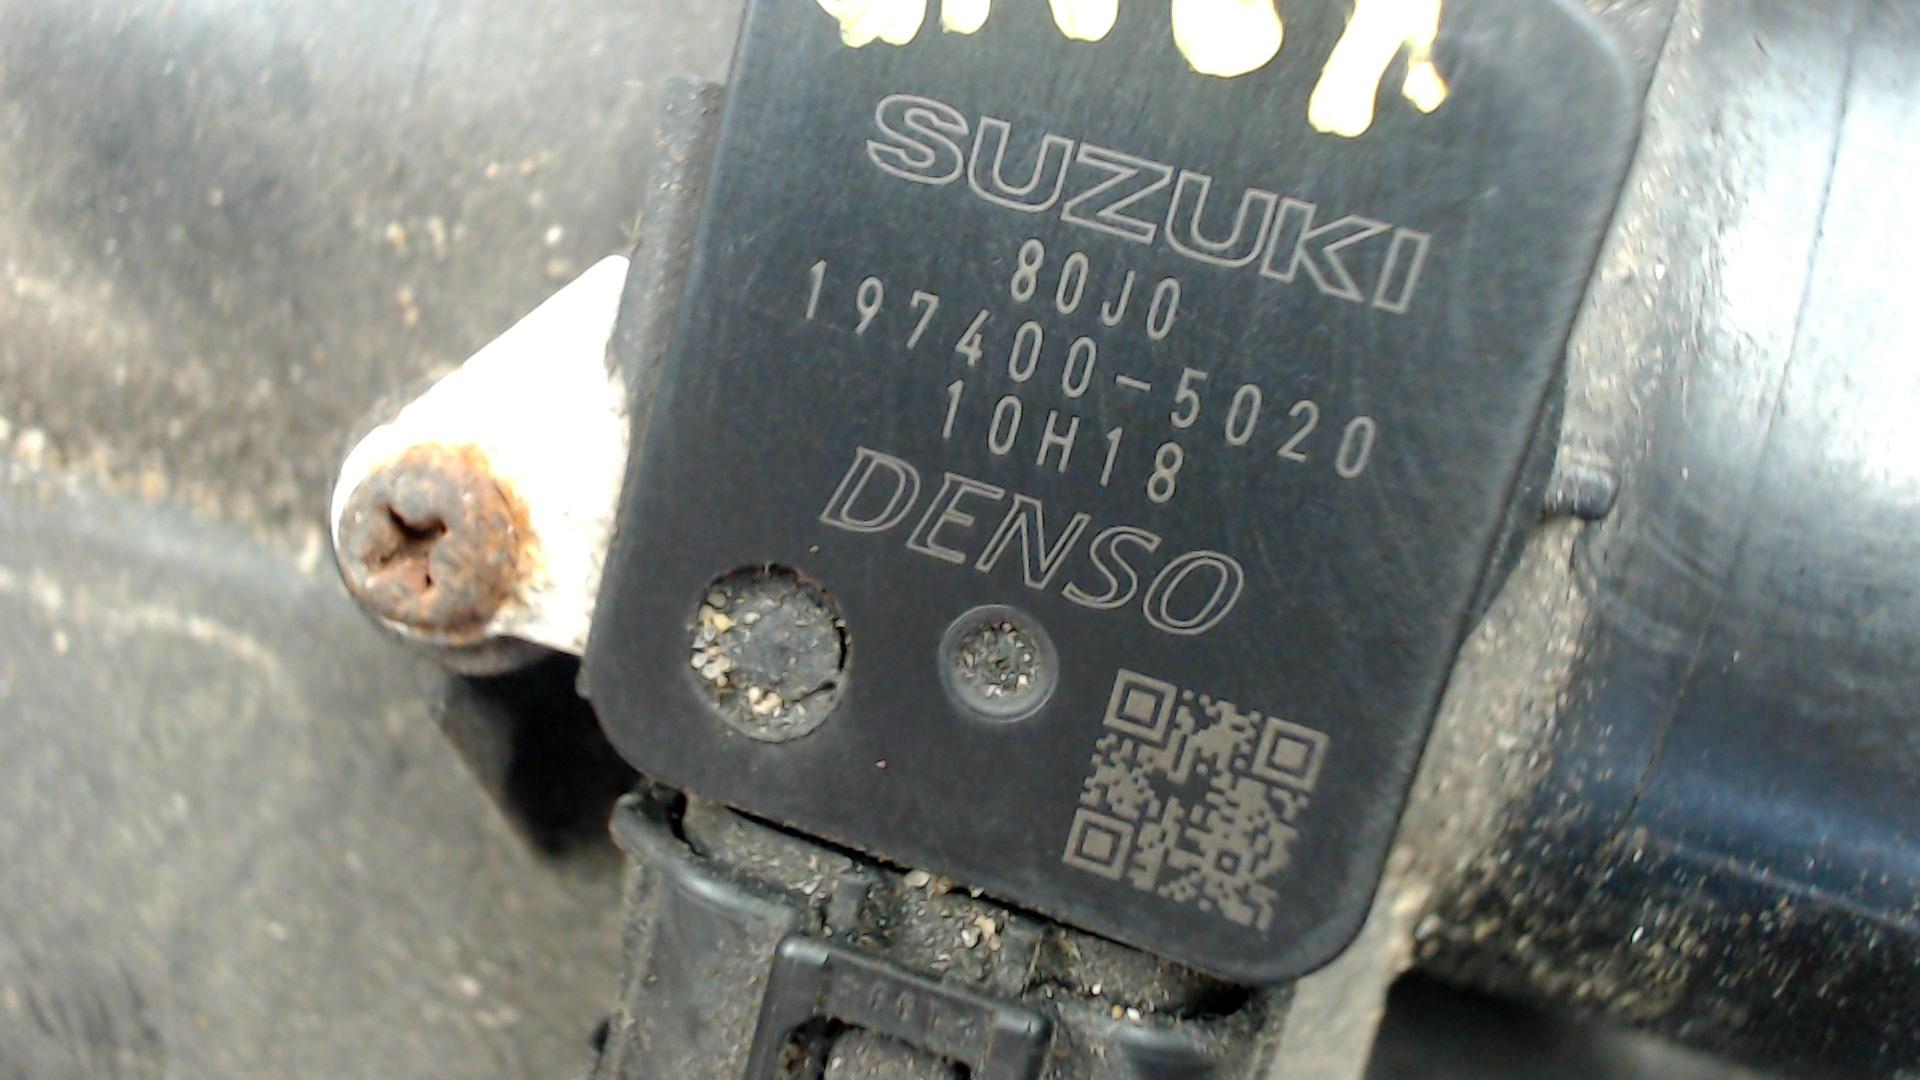 Расходомер Suzuki SX4 1 1974005020